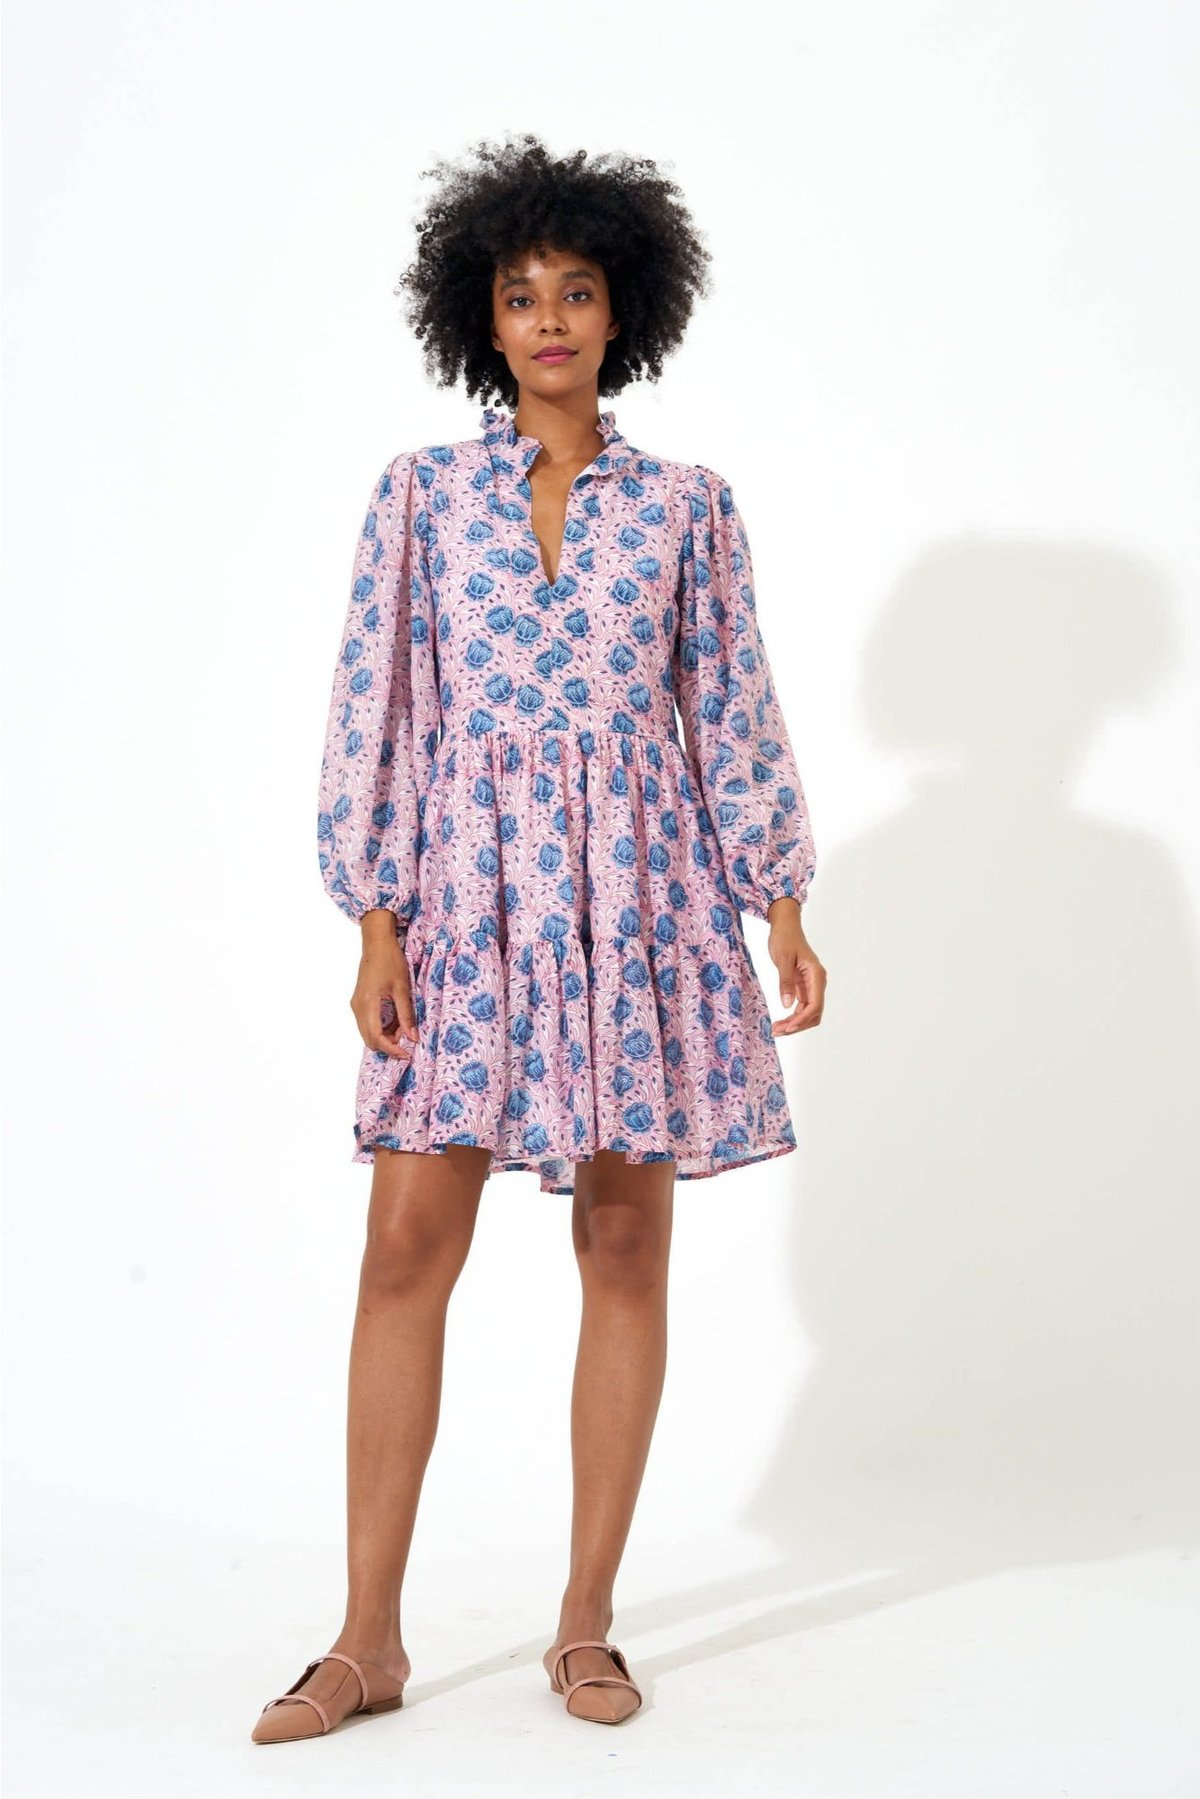 oliphantversailles_petal_yoke_dress_long_sleeveOli21Studio6033_1200x